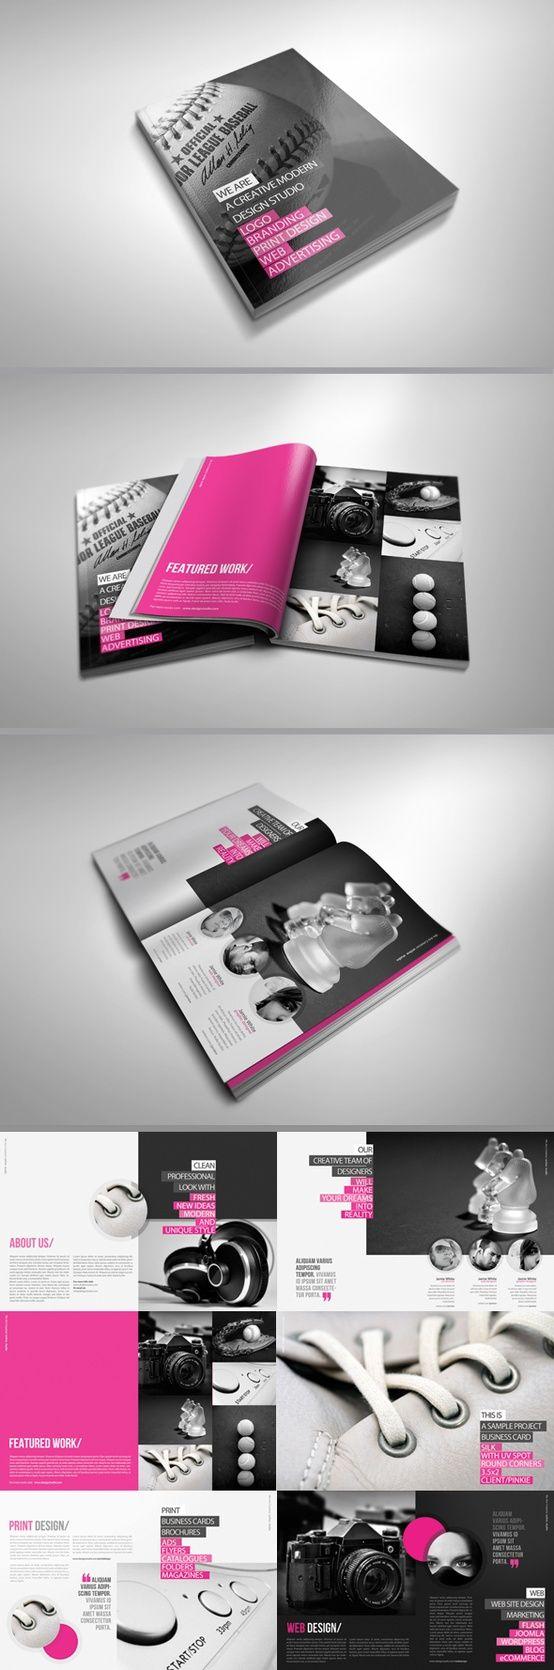 Editorial Design Concept